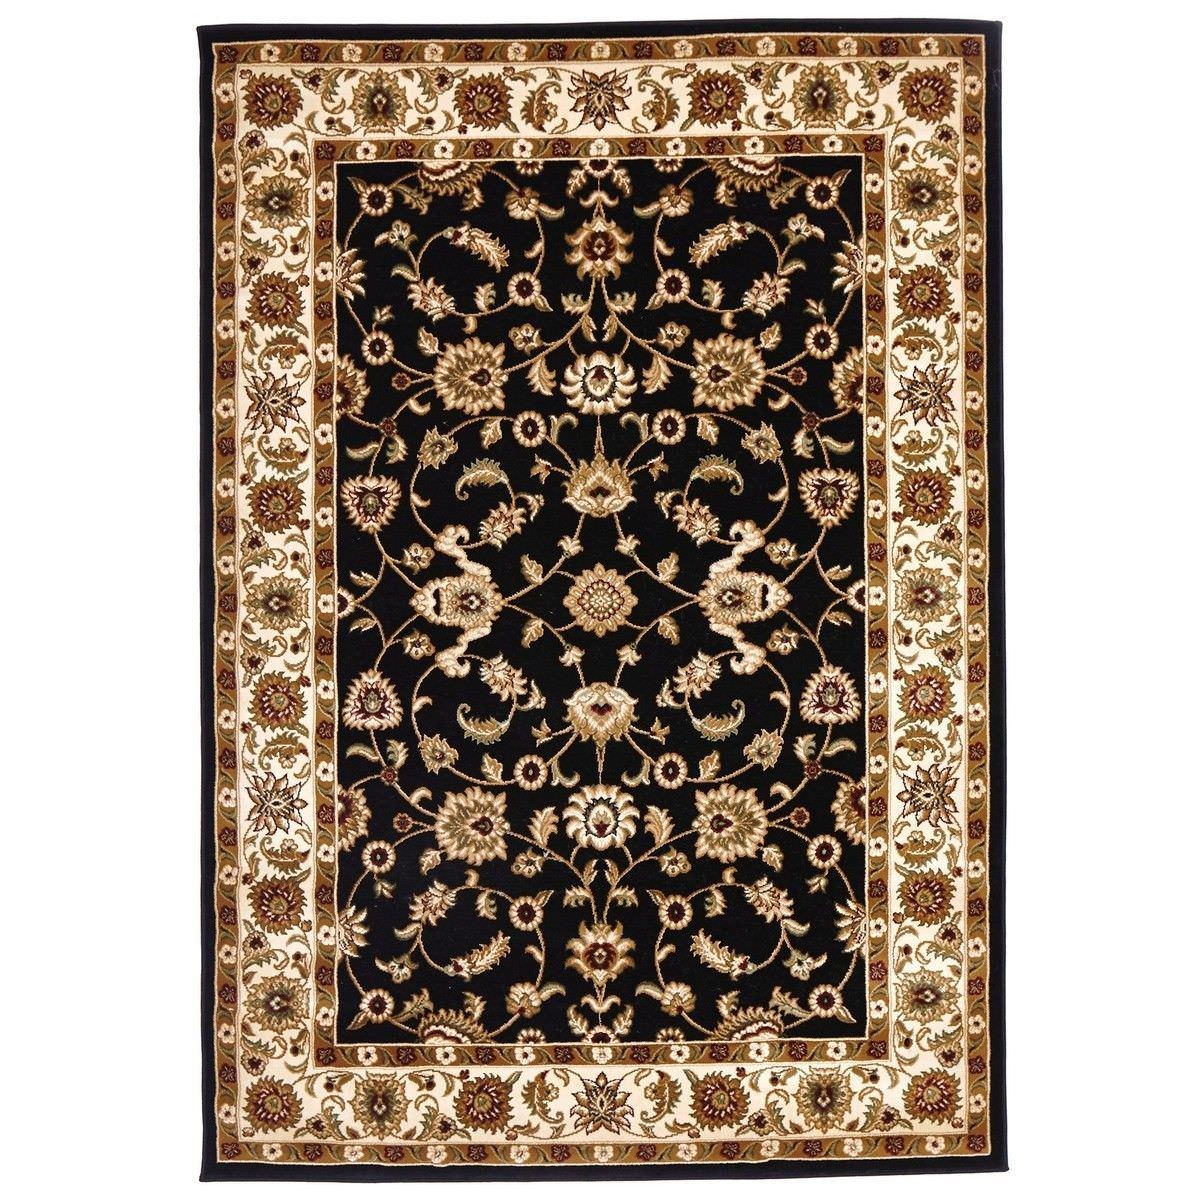 Sydney Classic Turkish Made Oriental Rug, 290x200cm, Black / Ivory